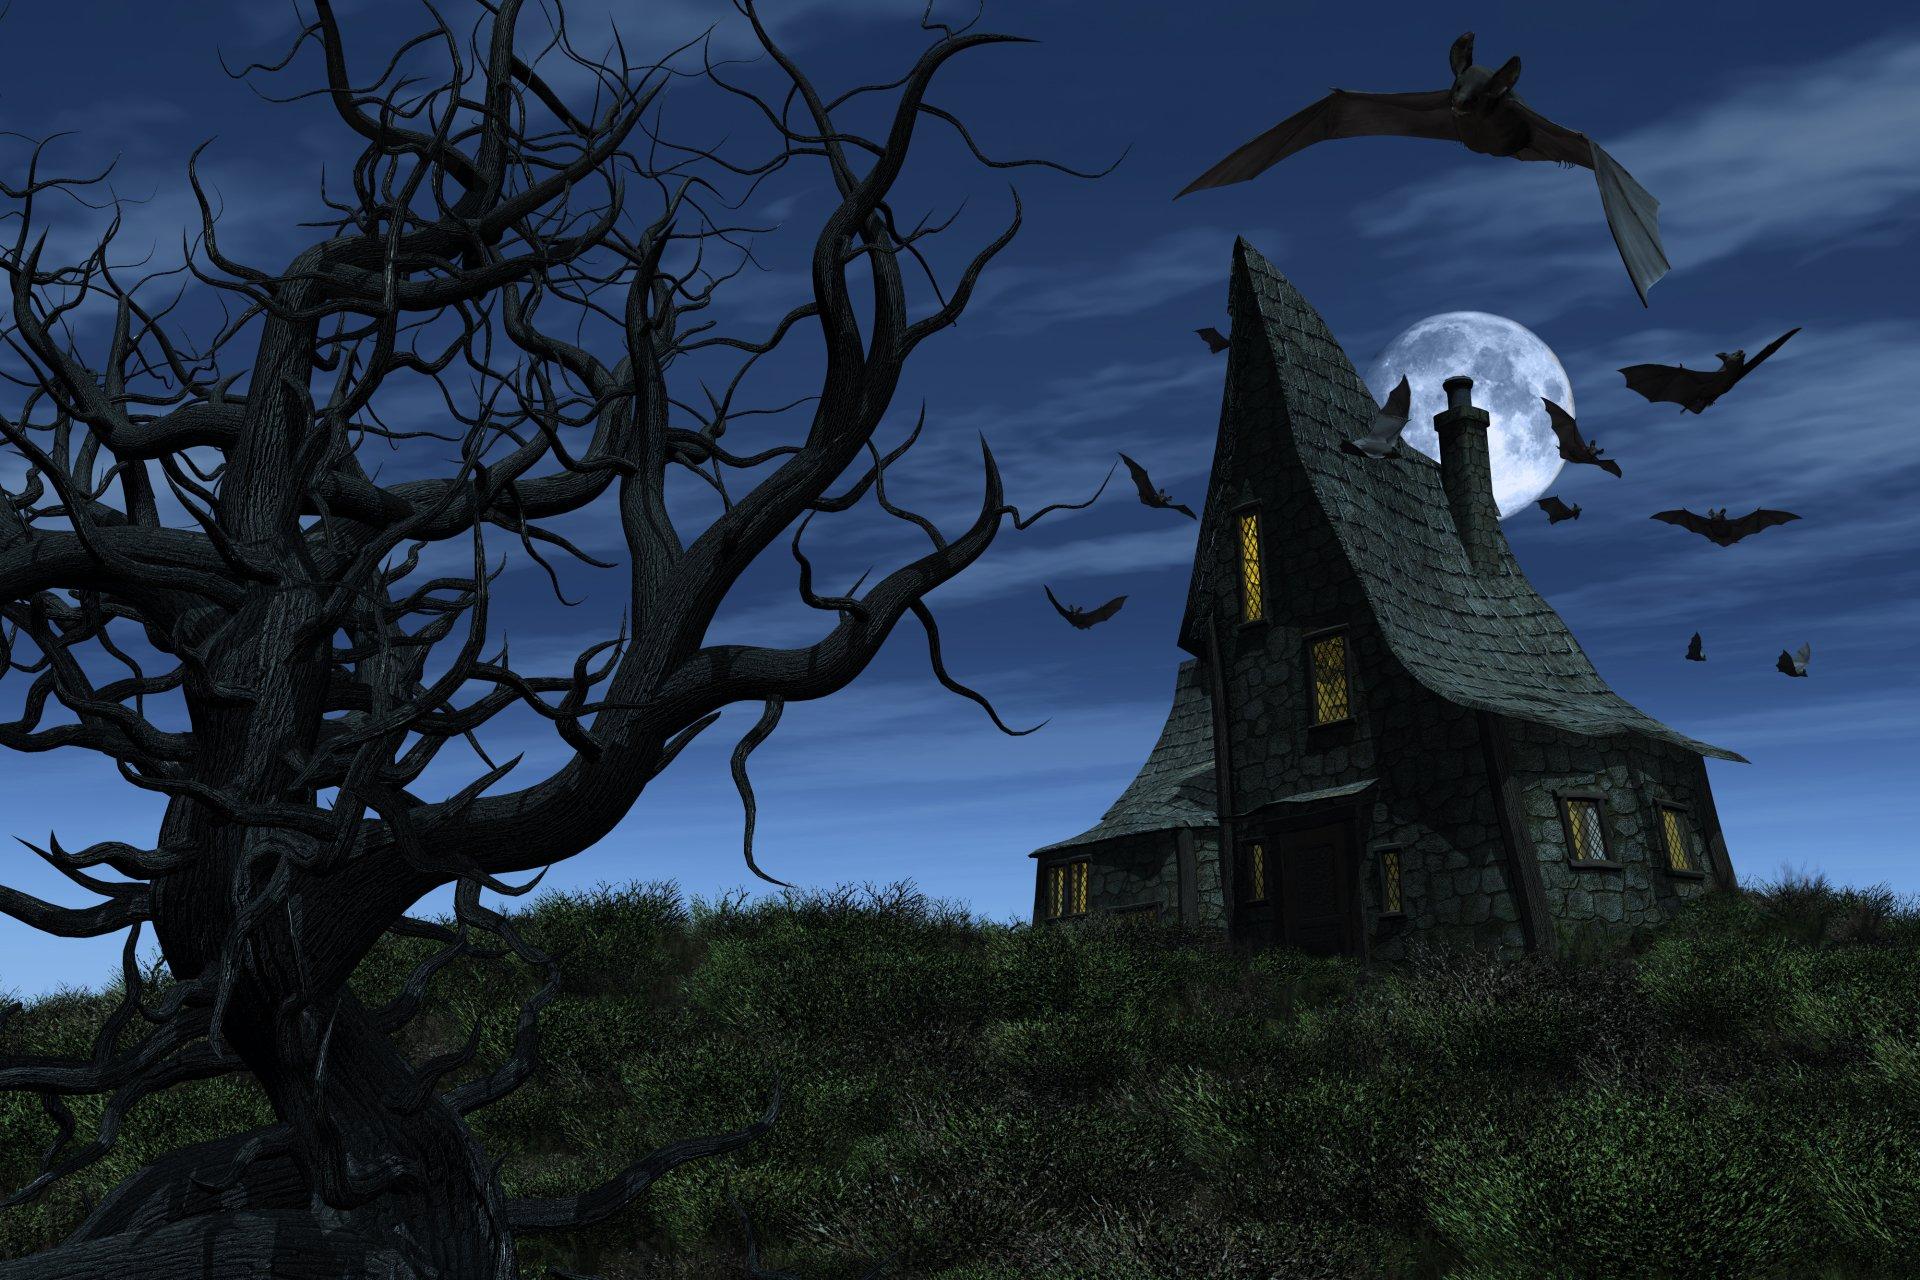 Halloween Haunted House 4k Ultra Hd Wallpaper